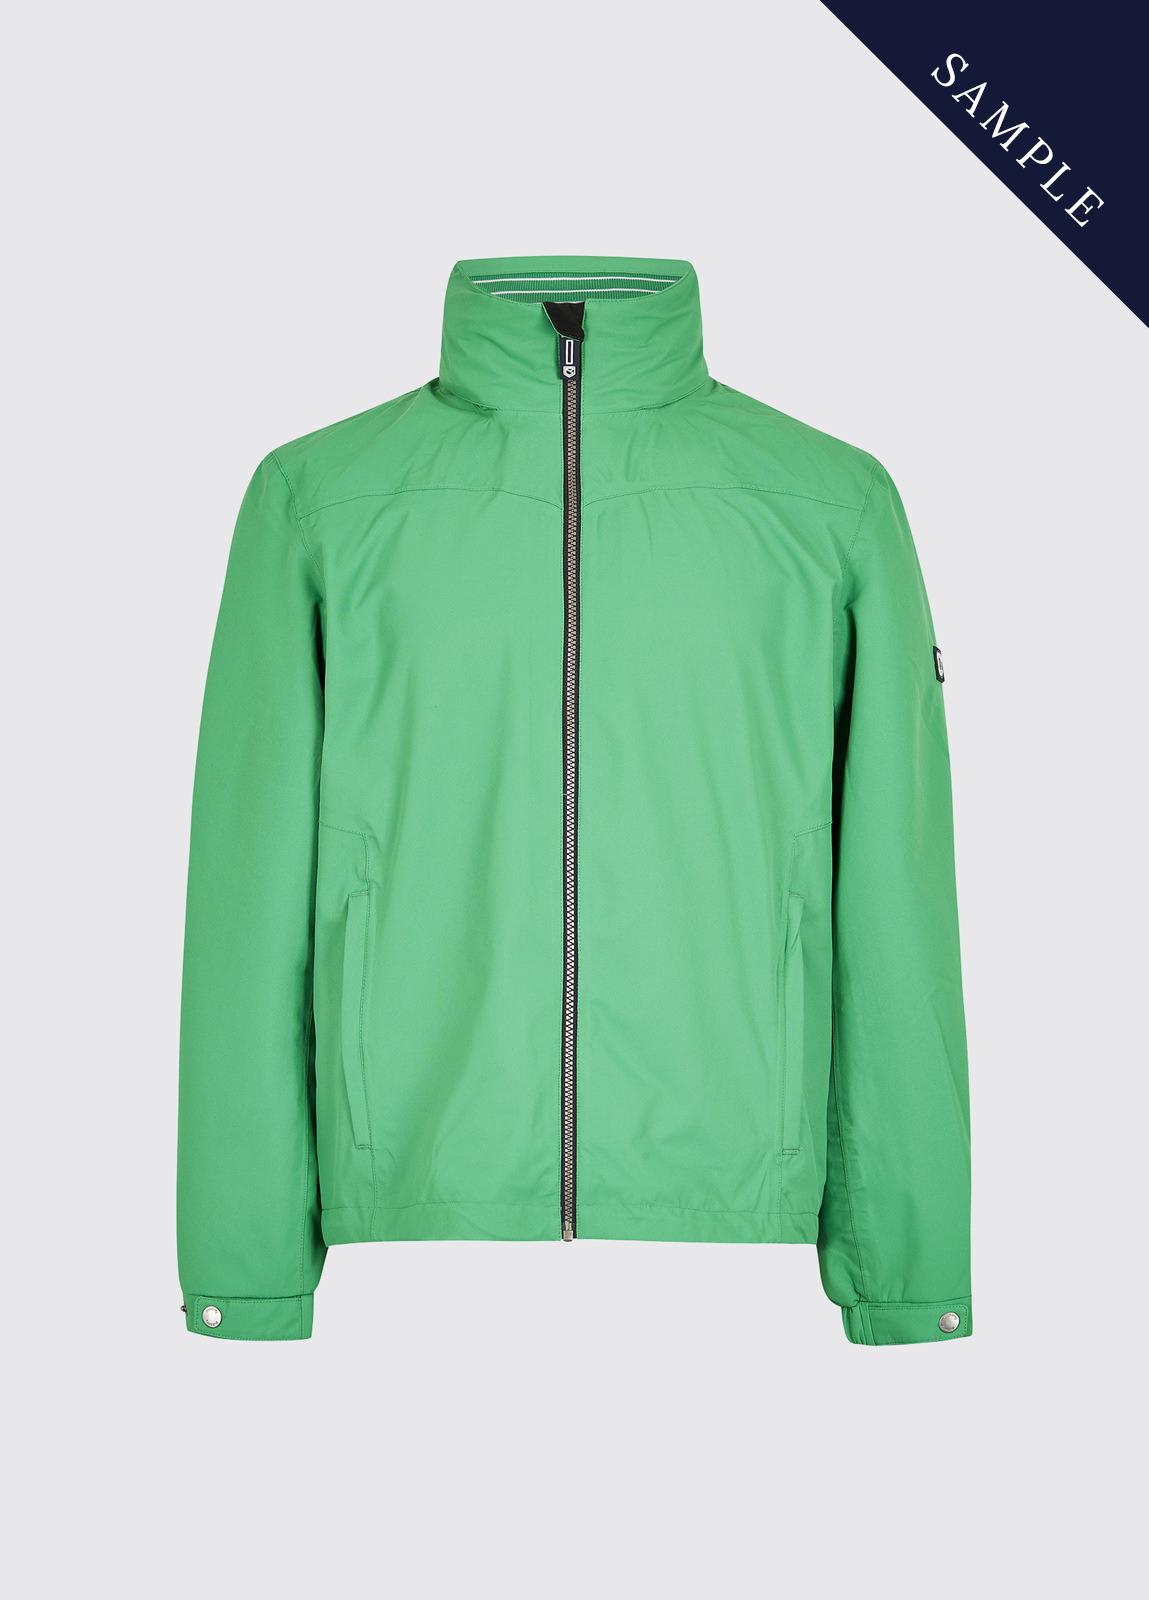 Bundoran Waterproof Jacket - Kelly Green - Size Medium